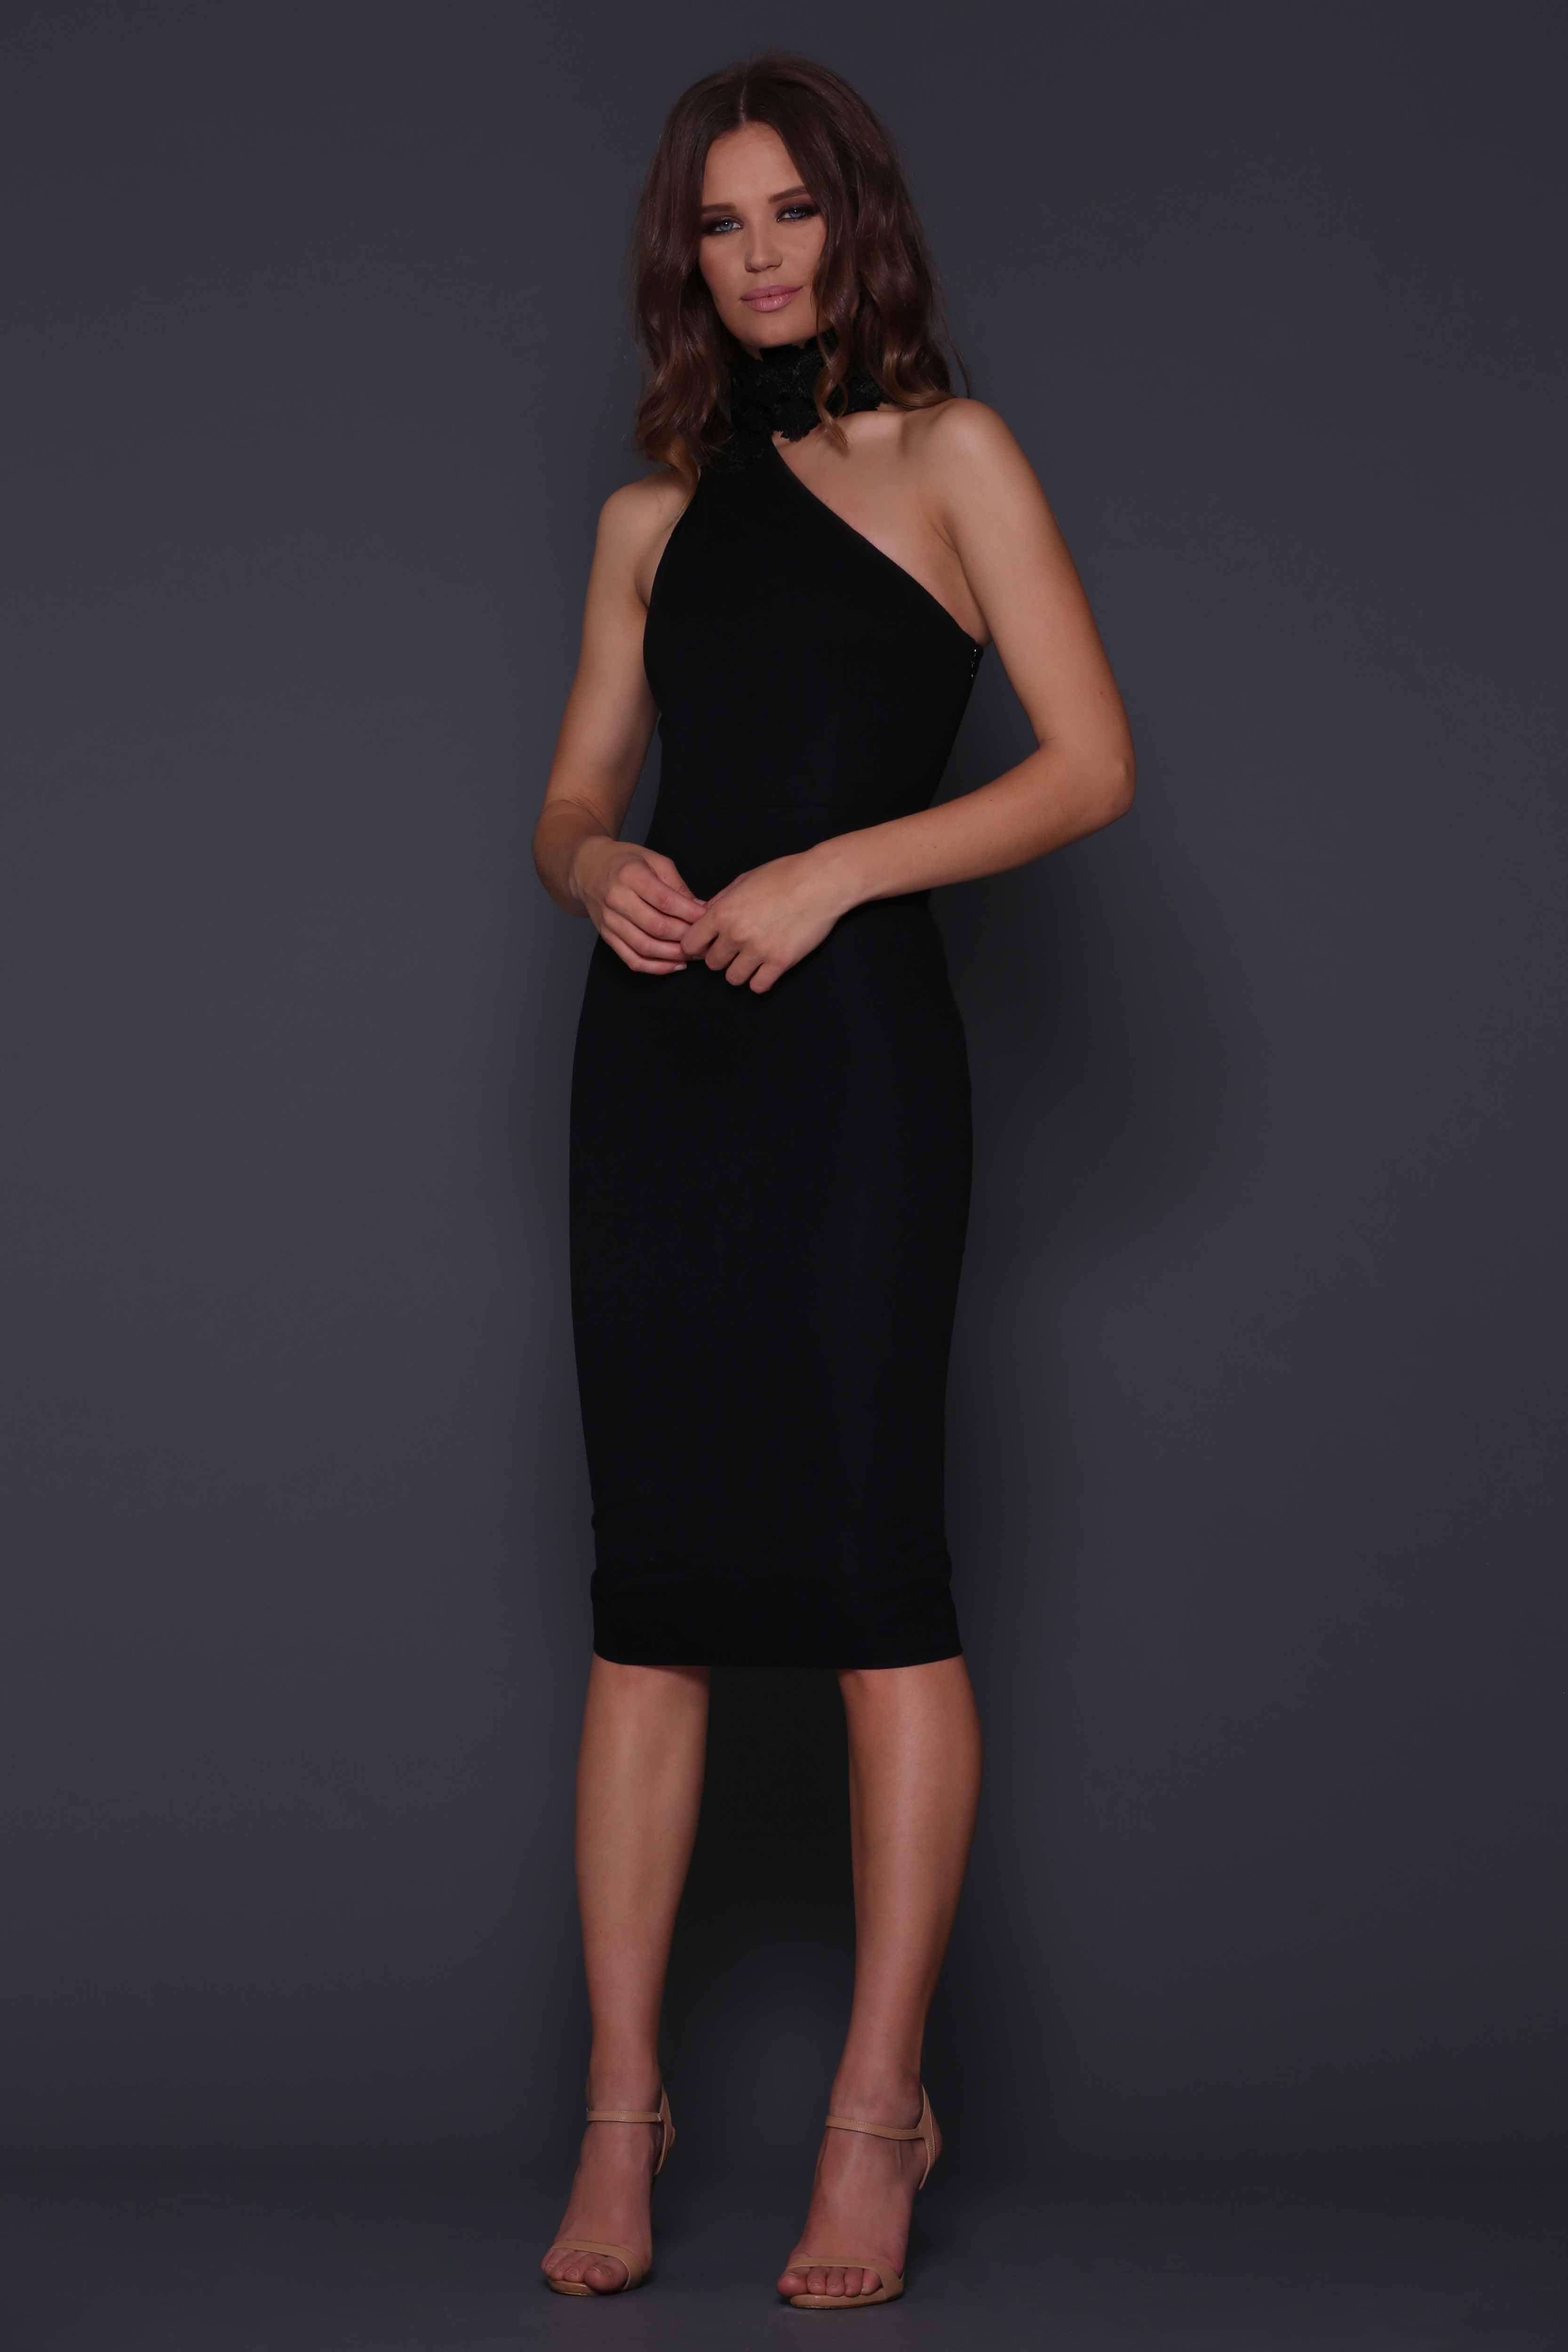 Black dress elle - Elle Zeitoune Harpers Black